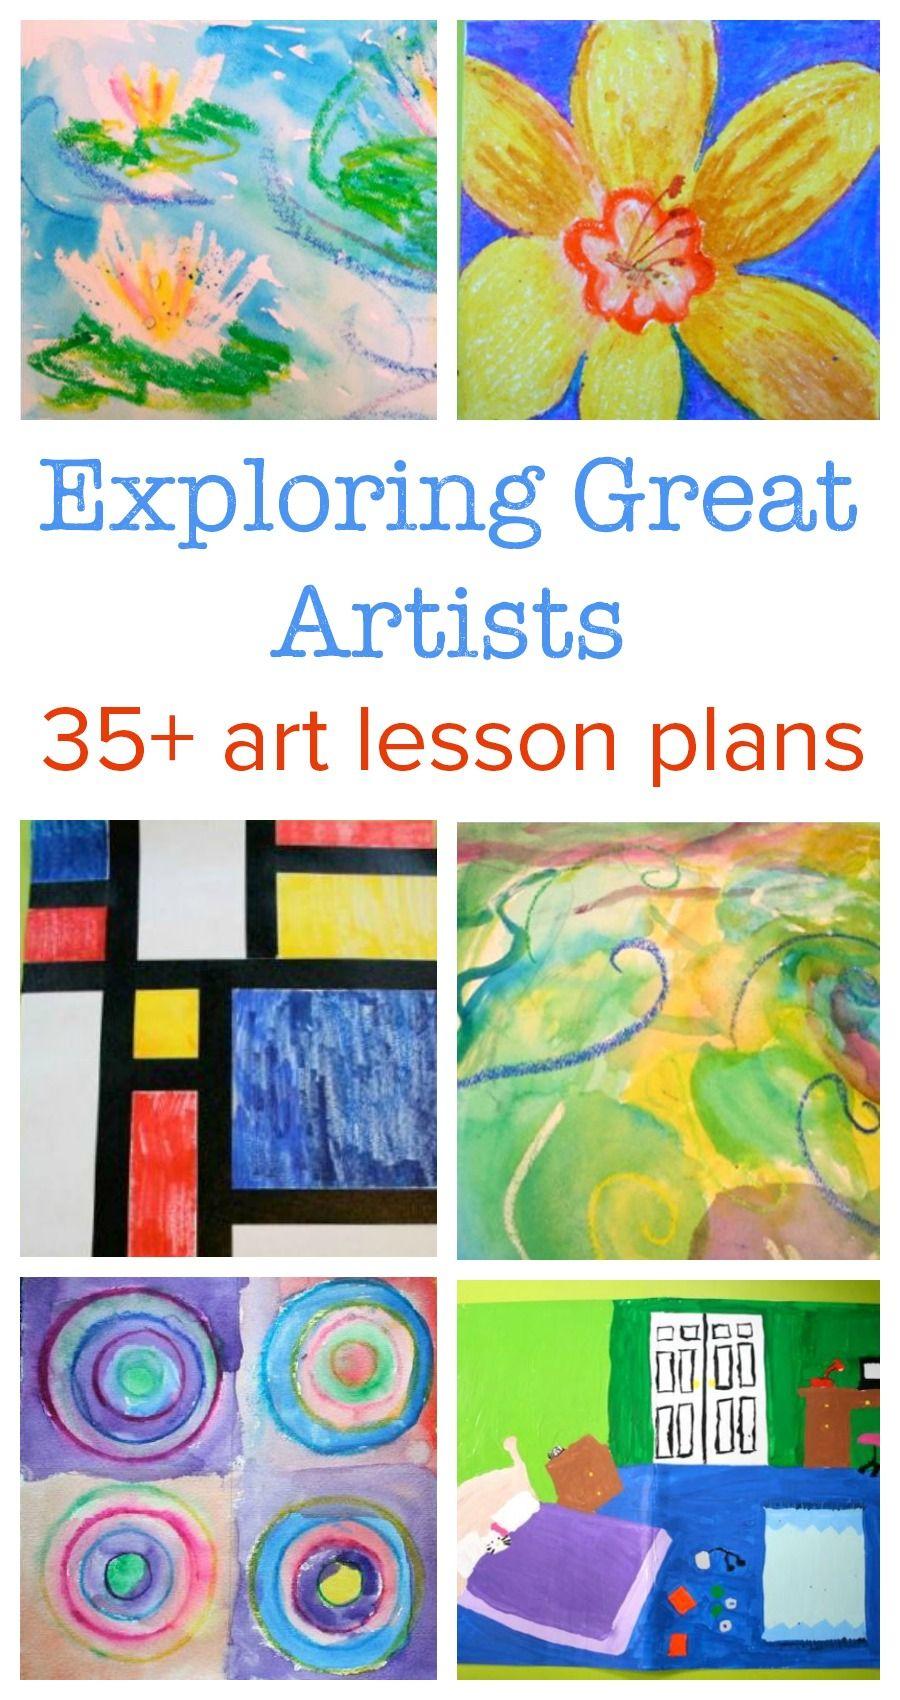 creative art lesson plans for preschoolers exploring great artists complete lesson plans 372